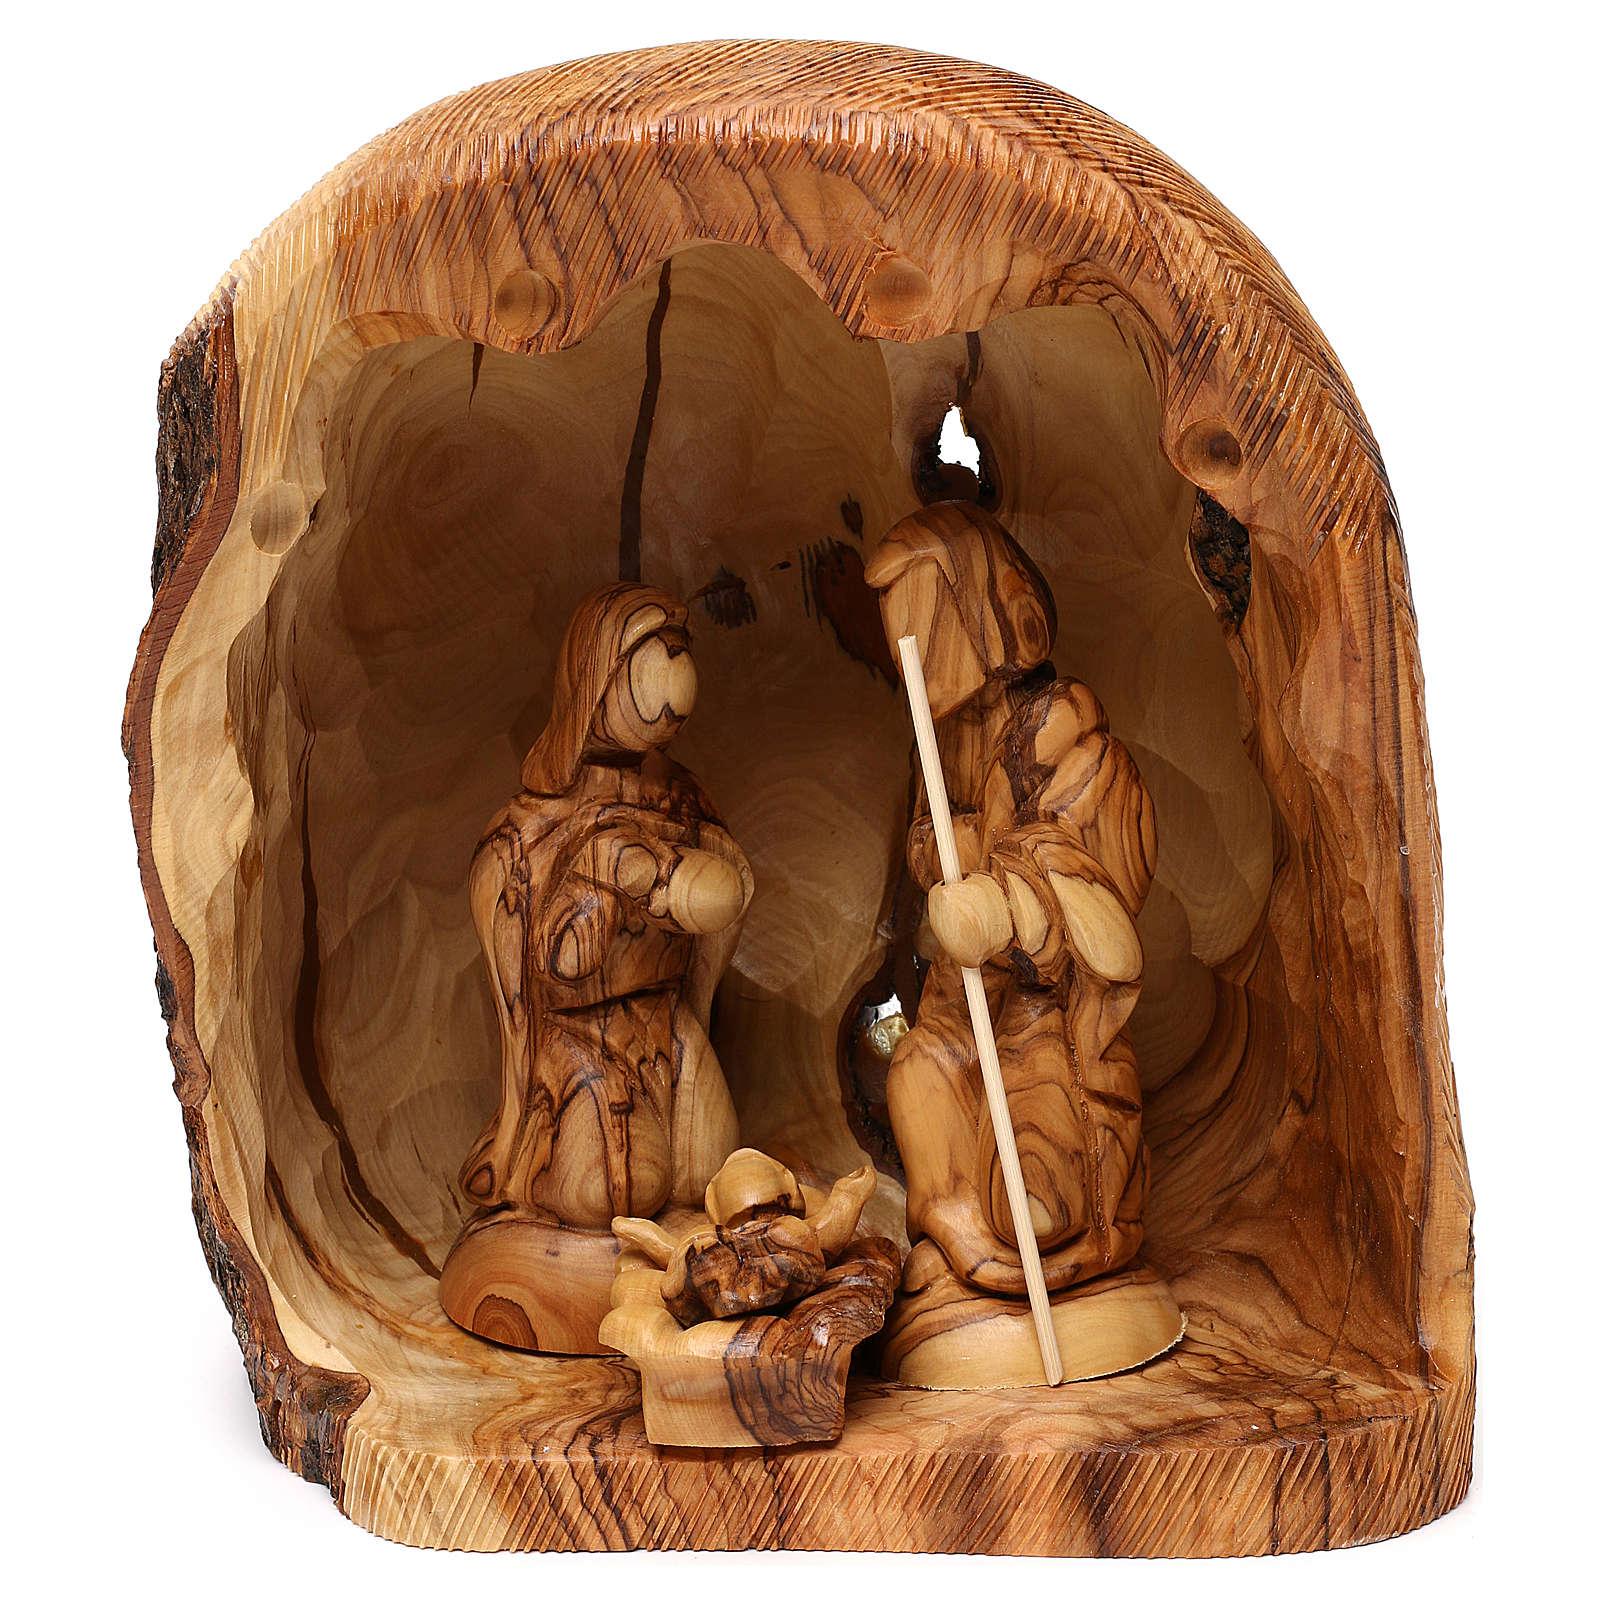 Nativity scene 3 pcs with cave in Bethlehem olive wood 25x20x15 cm 4